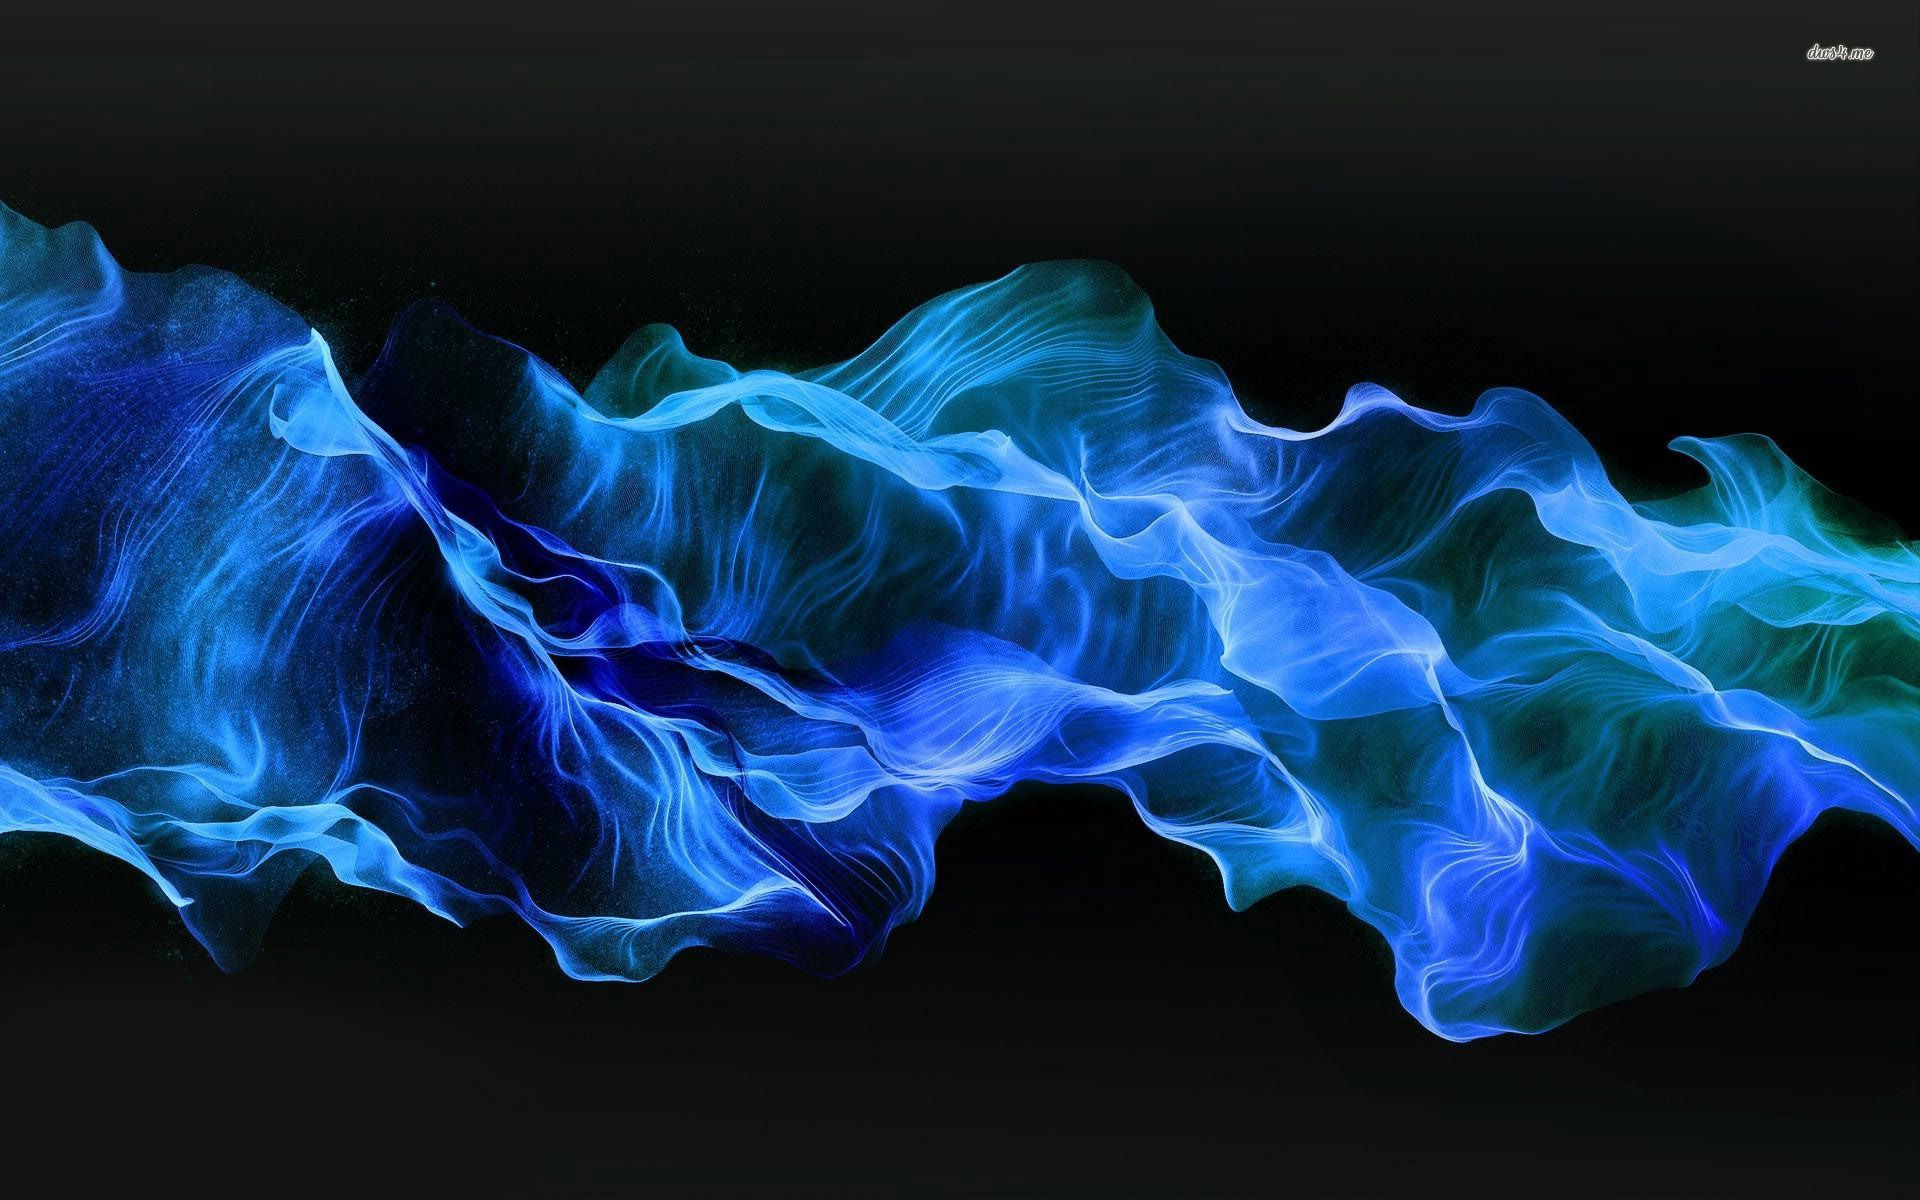 Blue Smoke Wallpaper Wallpaper Uñas azules